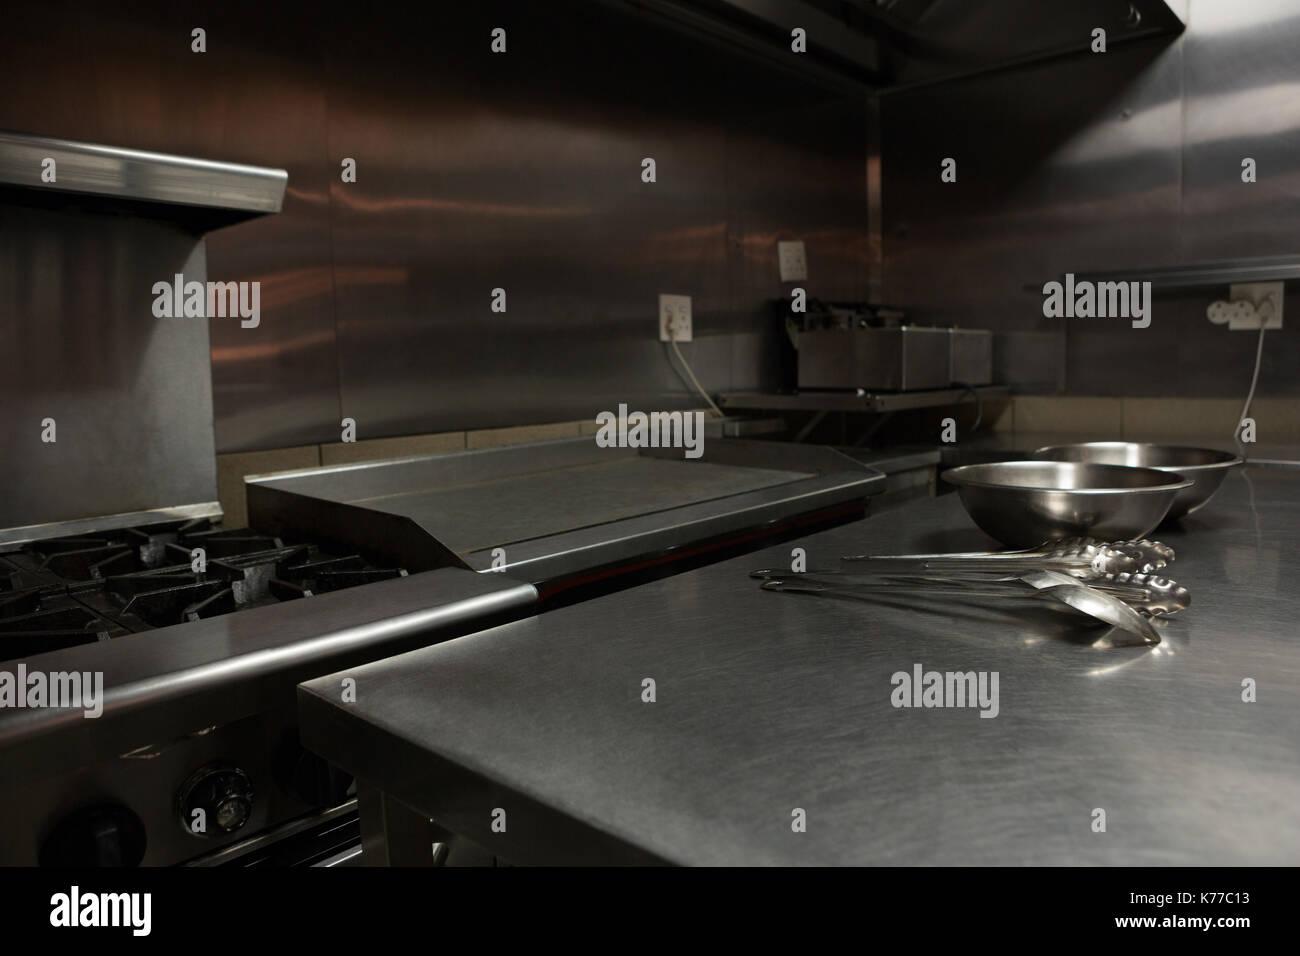 Etonnant Various Utensils On Worktop In Commercial Kitchen